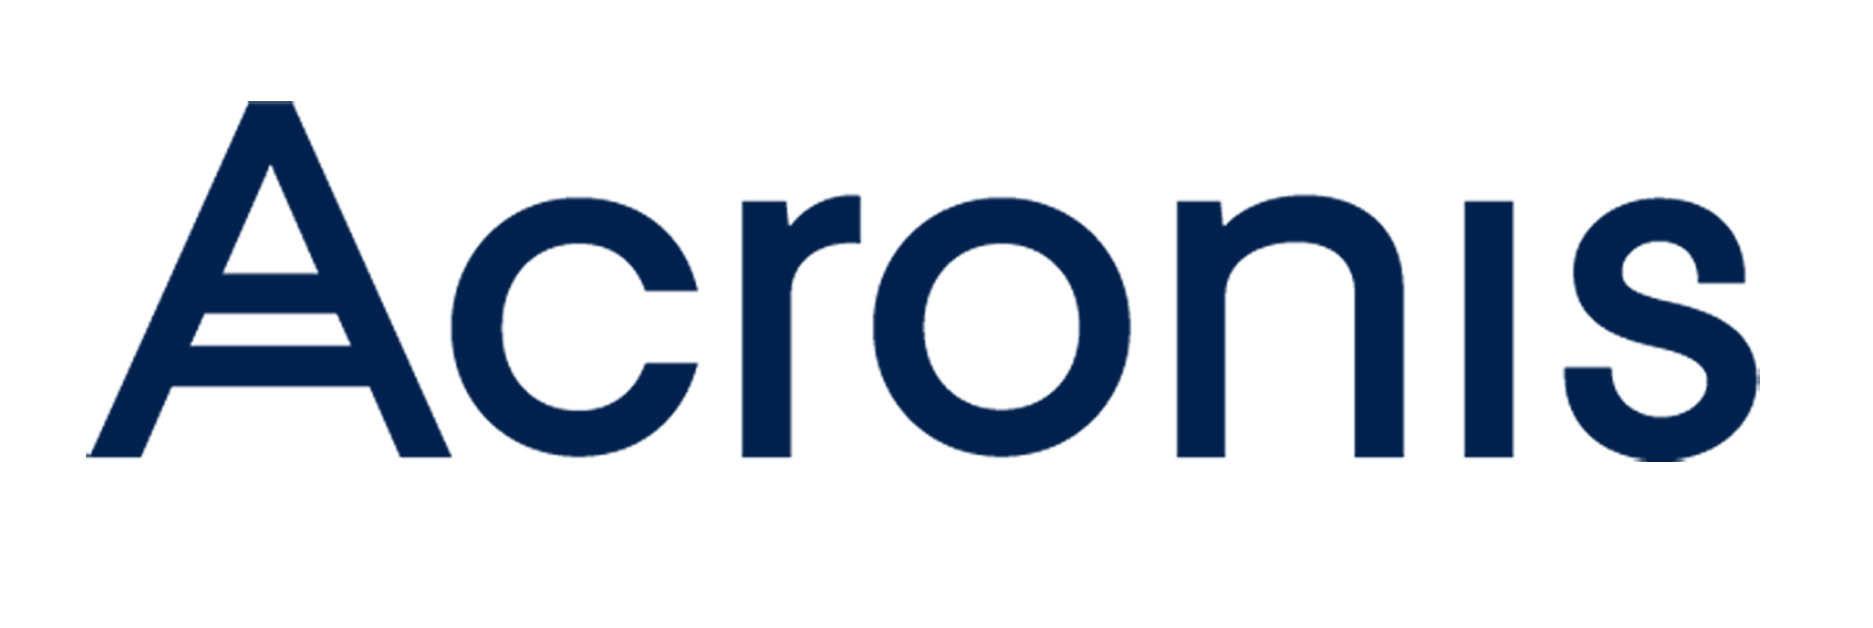 Acronis_Logo.jpg